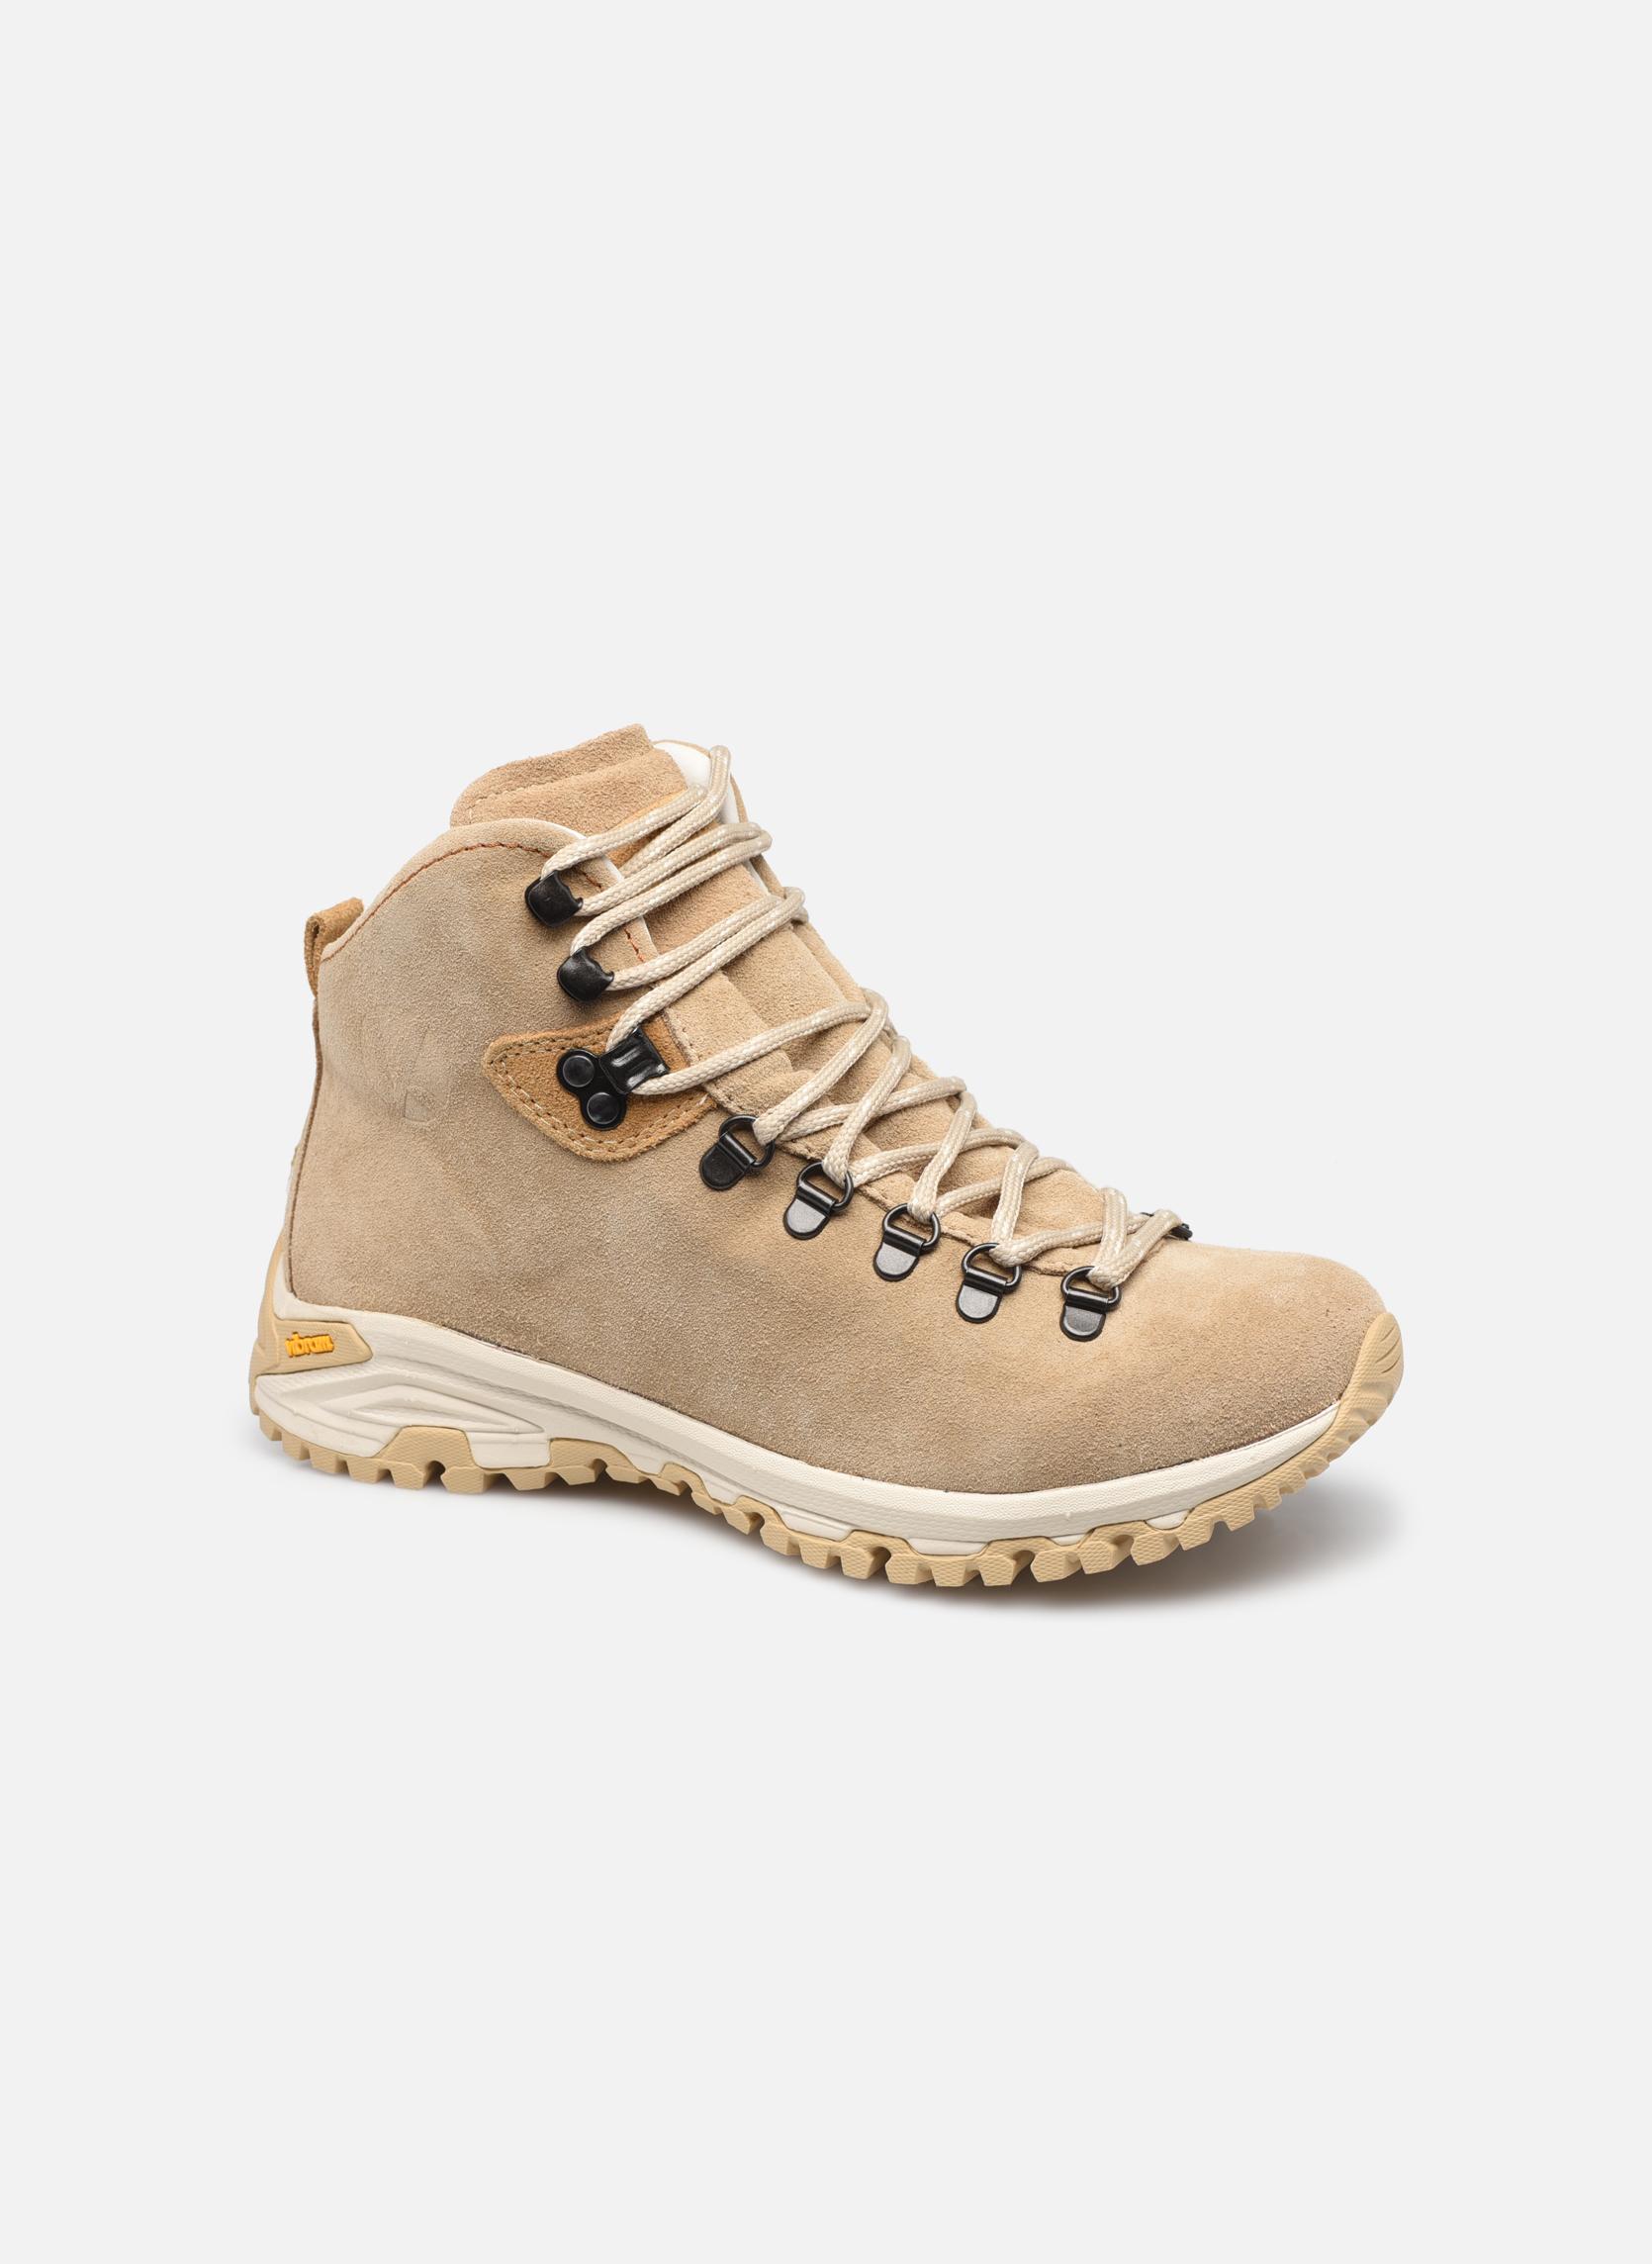 uk availability 0d4df 2a785 Kimberfeel SELLA (Beige) - Chaussures de sport chez Sarenza (298057)  GH8HUA1Z - naturelle-beaute-bio.fr